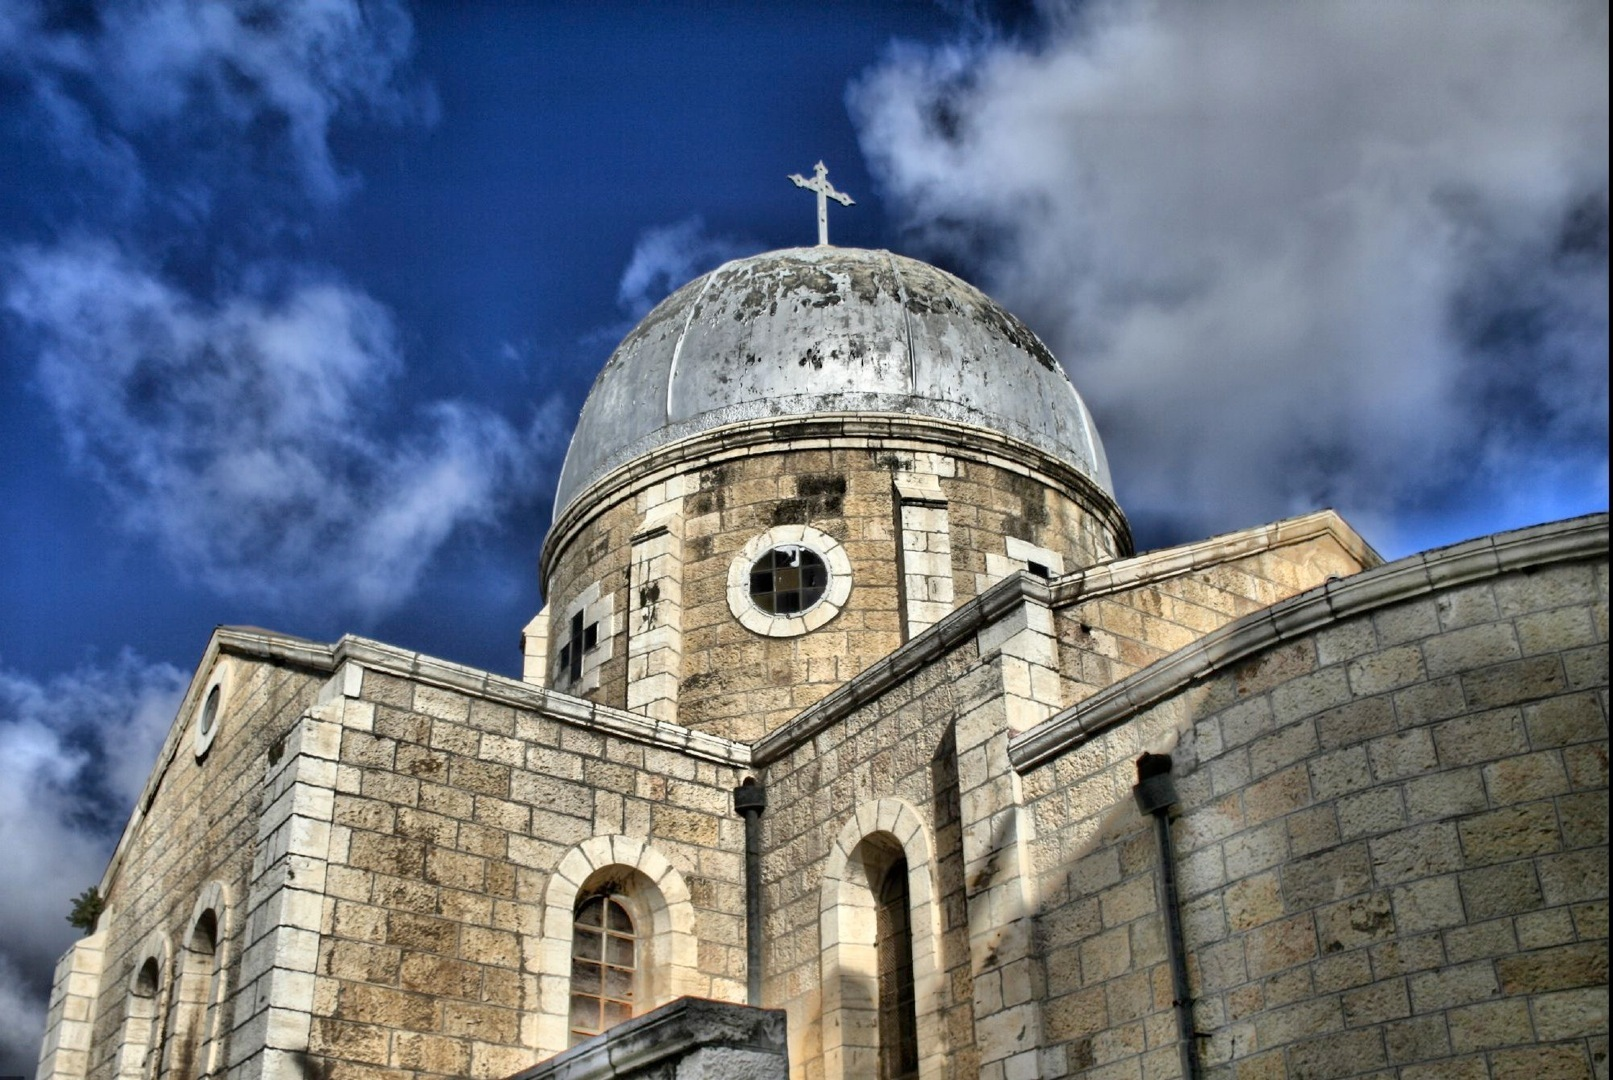 2. Iglesia armenia en Jerusalén. Autor, Papalars